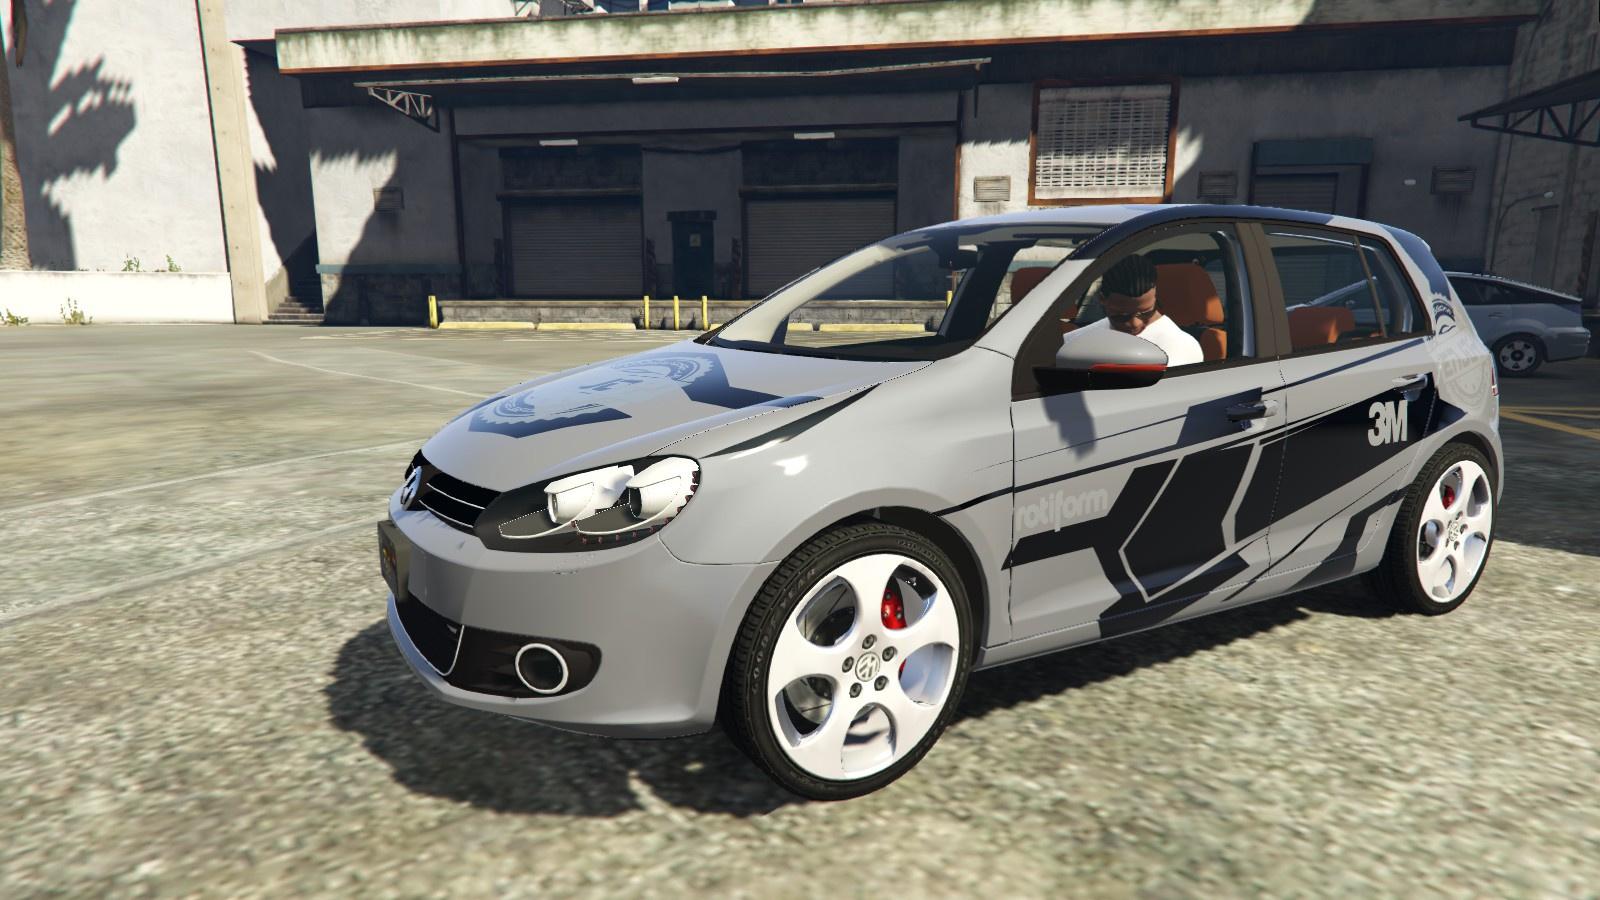 Vw Golf Mk6 Gti Enjoy 3m Car Wrap Paintjob Gta5 Mods Com